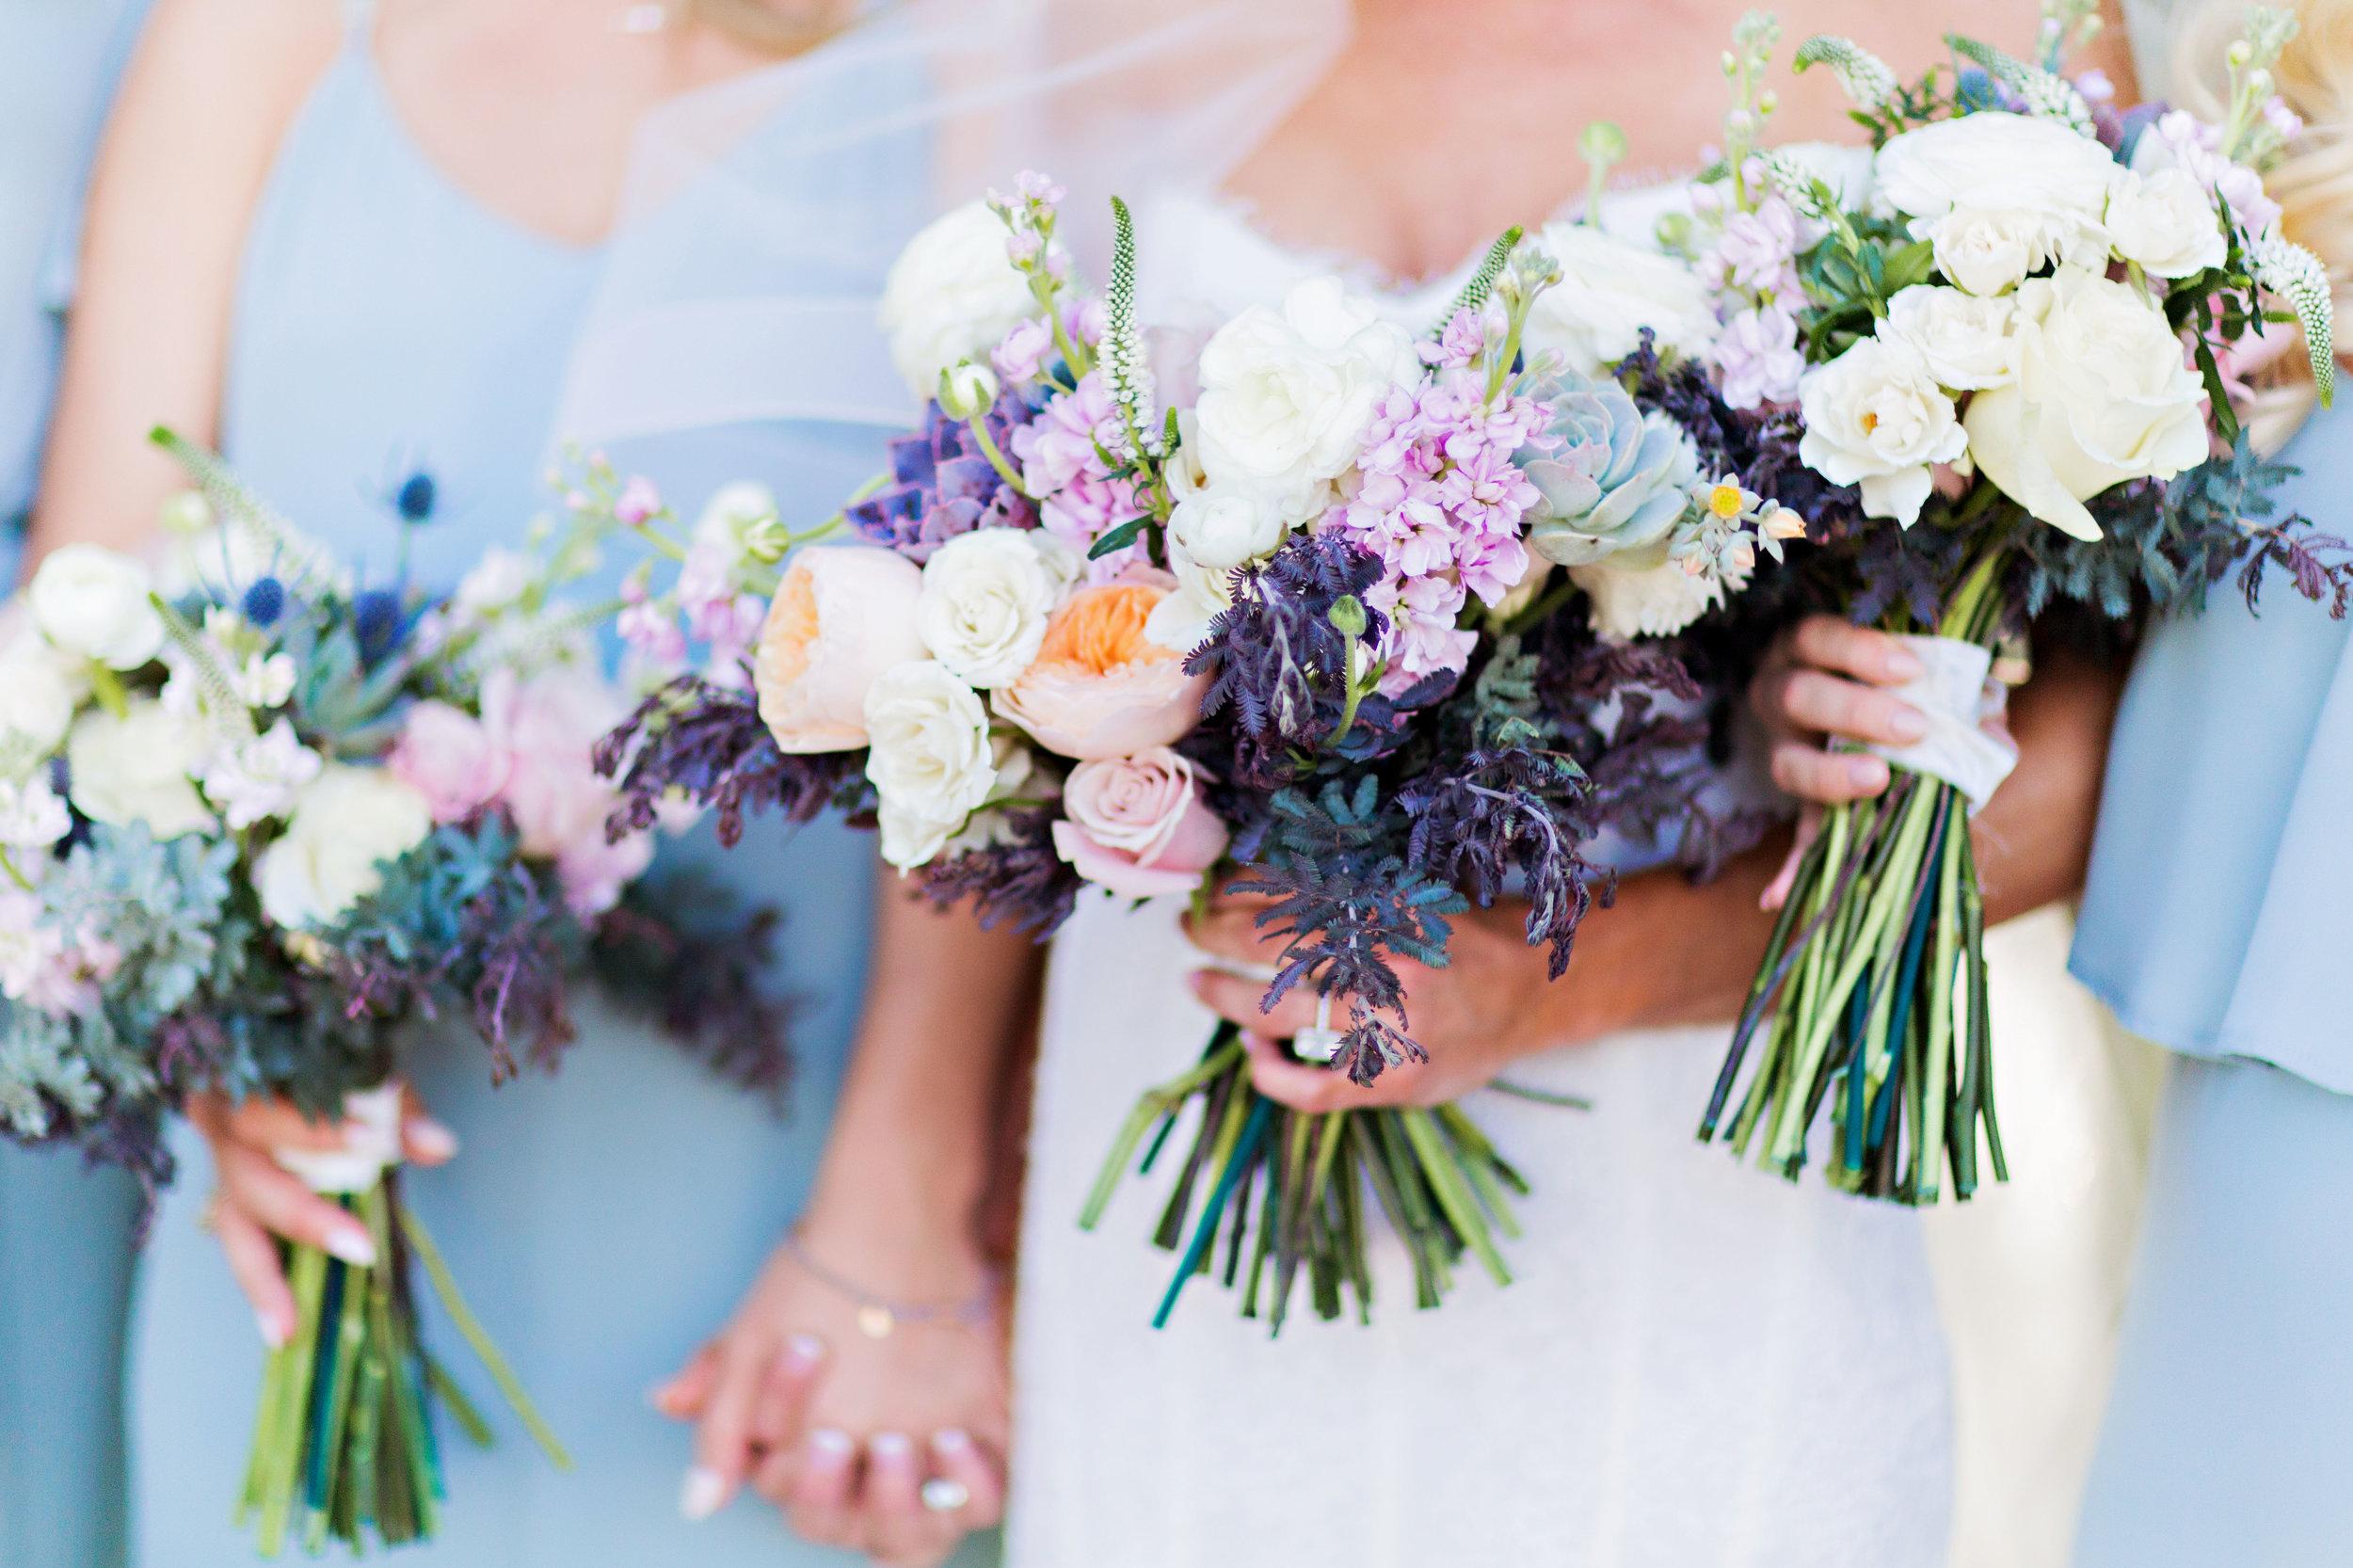 Classic blush, dusty blue, and lavender bridesmaids bouquets